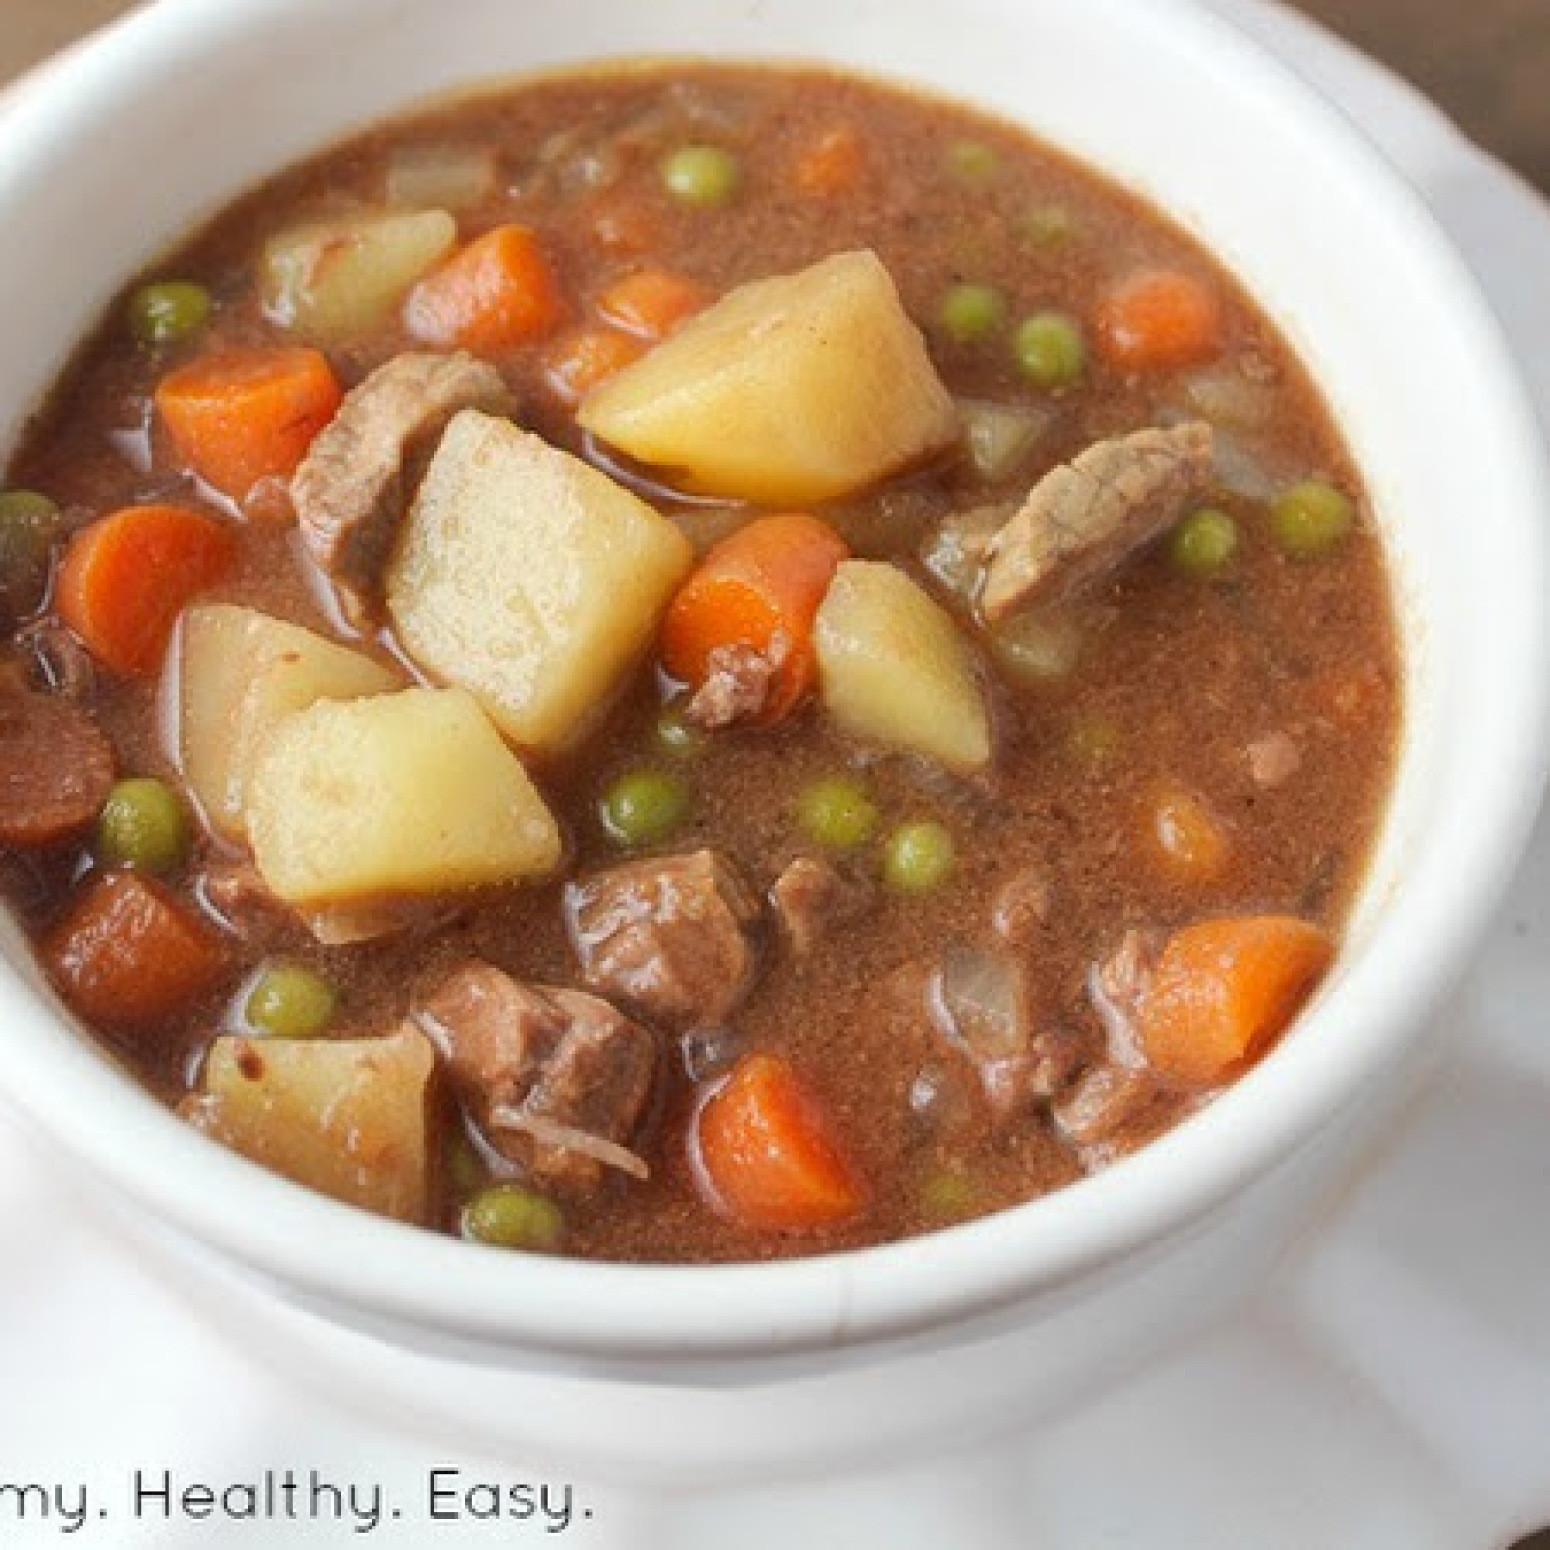 Beef Stew Crock Pot Recipes  Simple Crock Pot Beef Stew Recipe